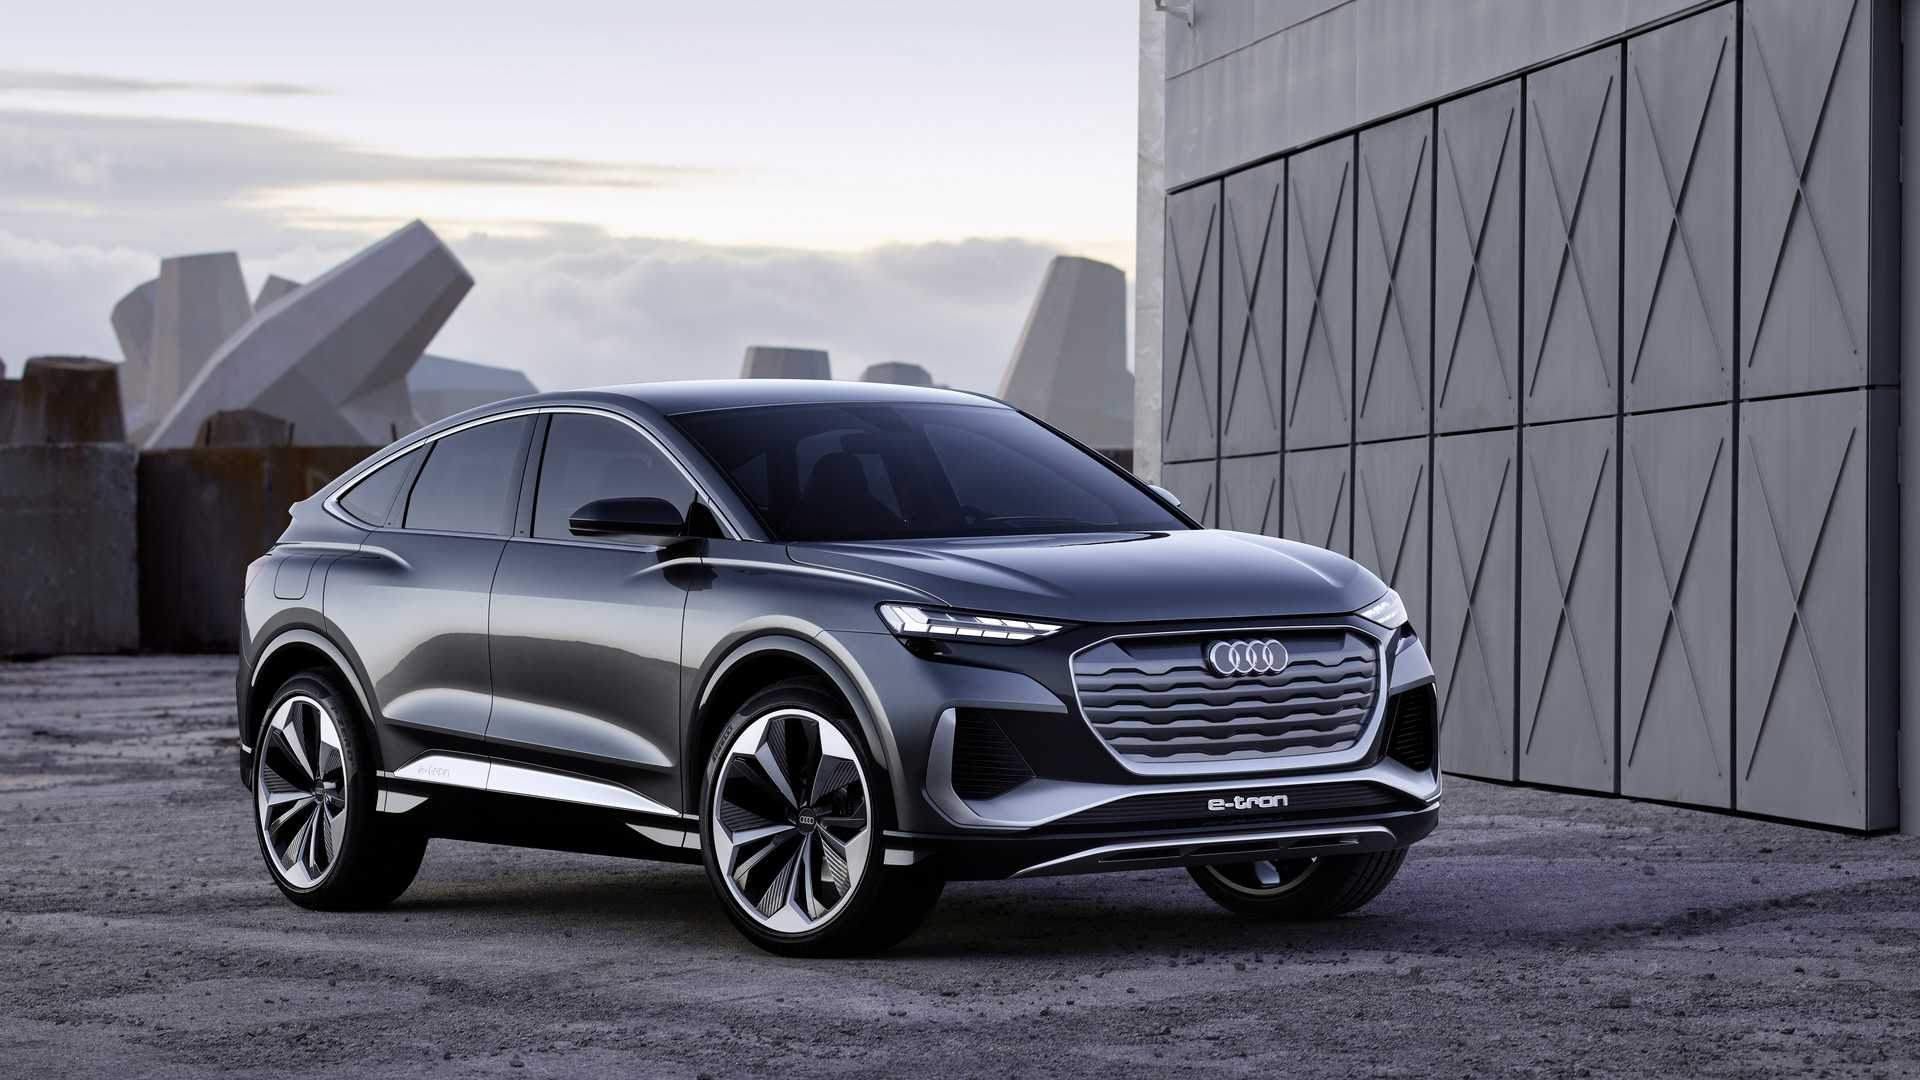 Audi Q4 Sportback E-Tron Concept Getts Coupe-Like Body To ...